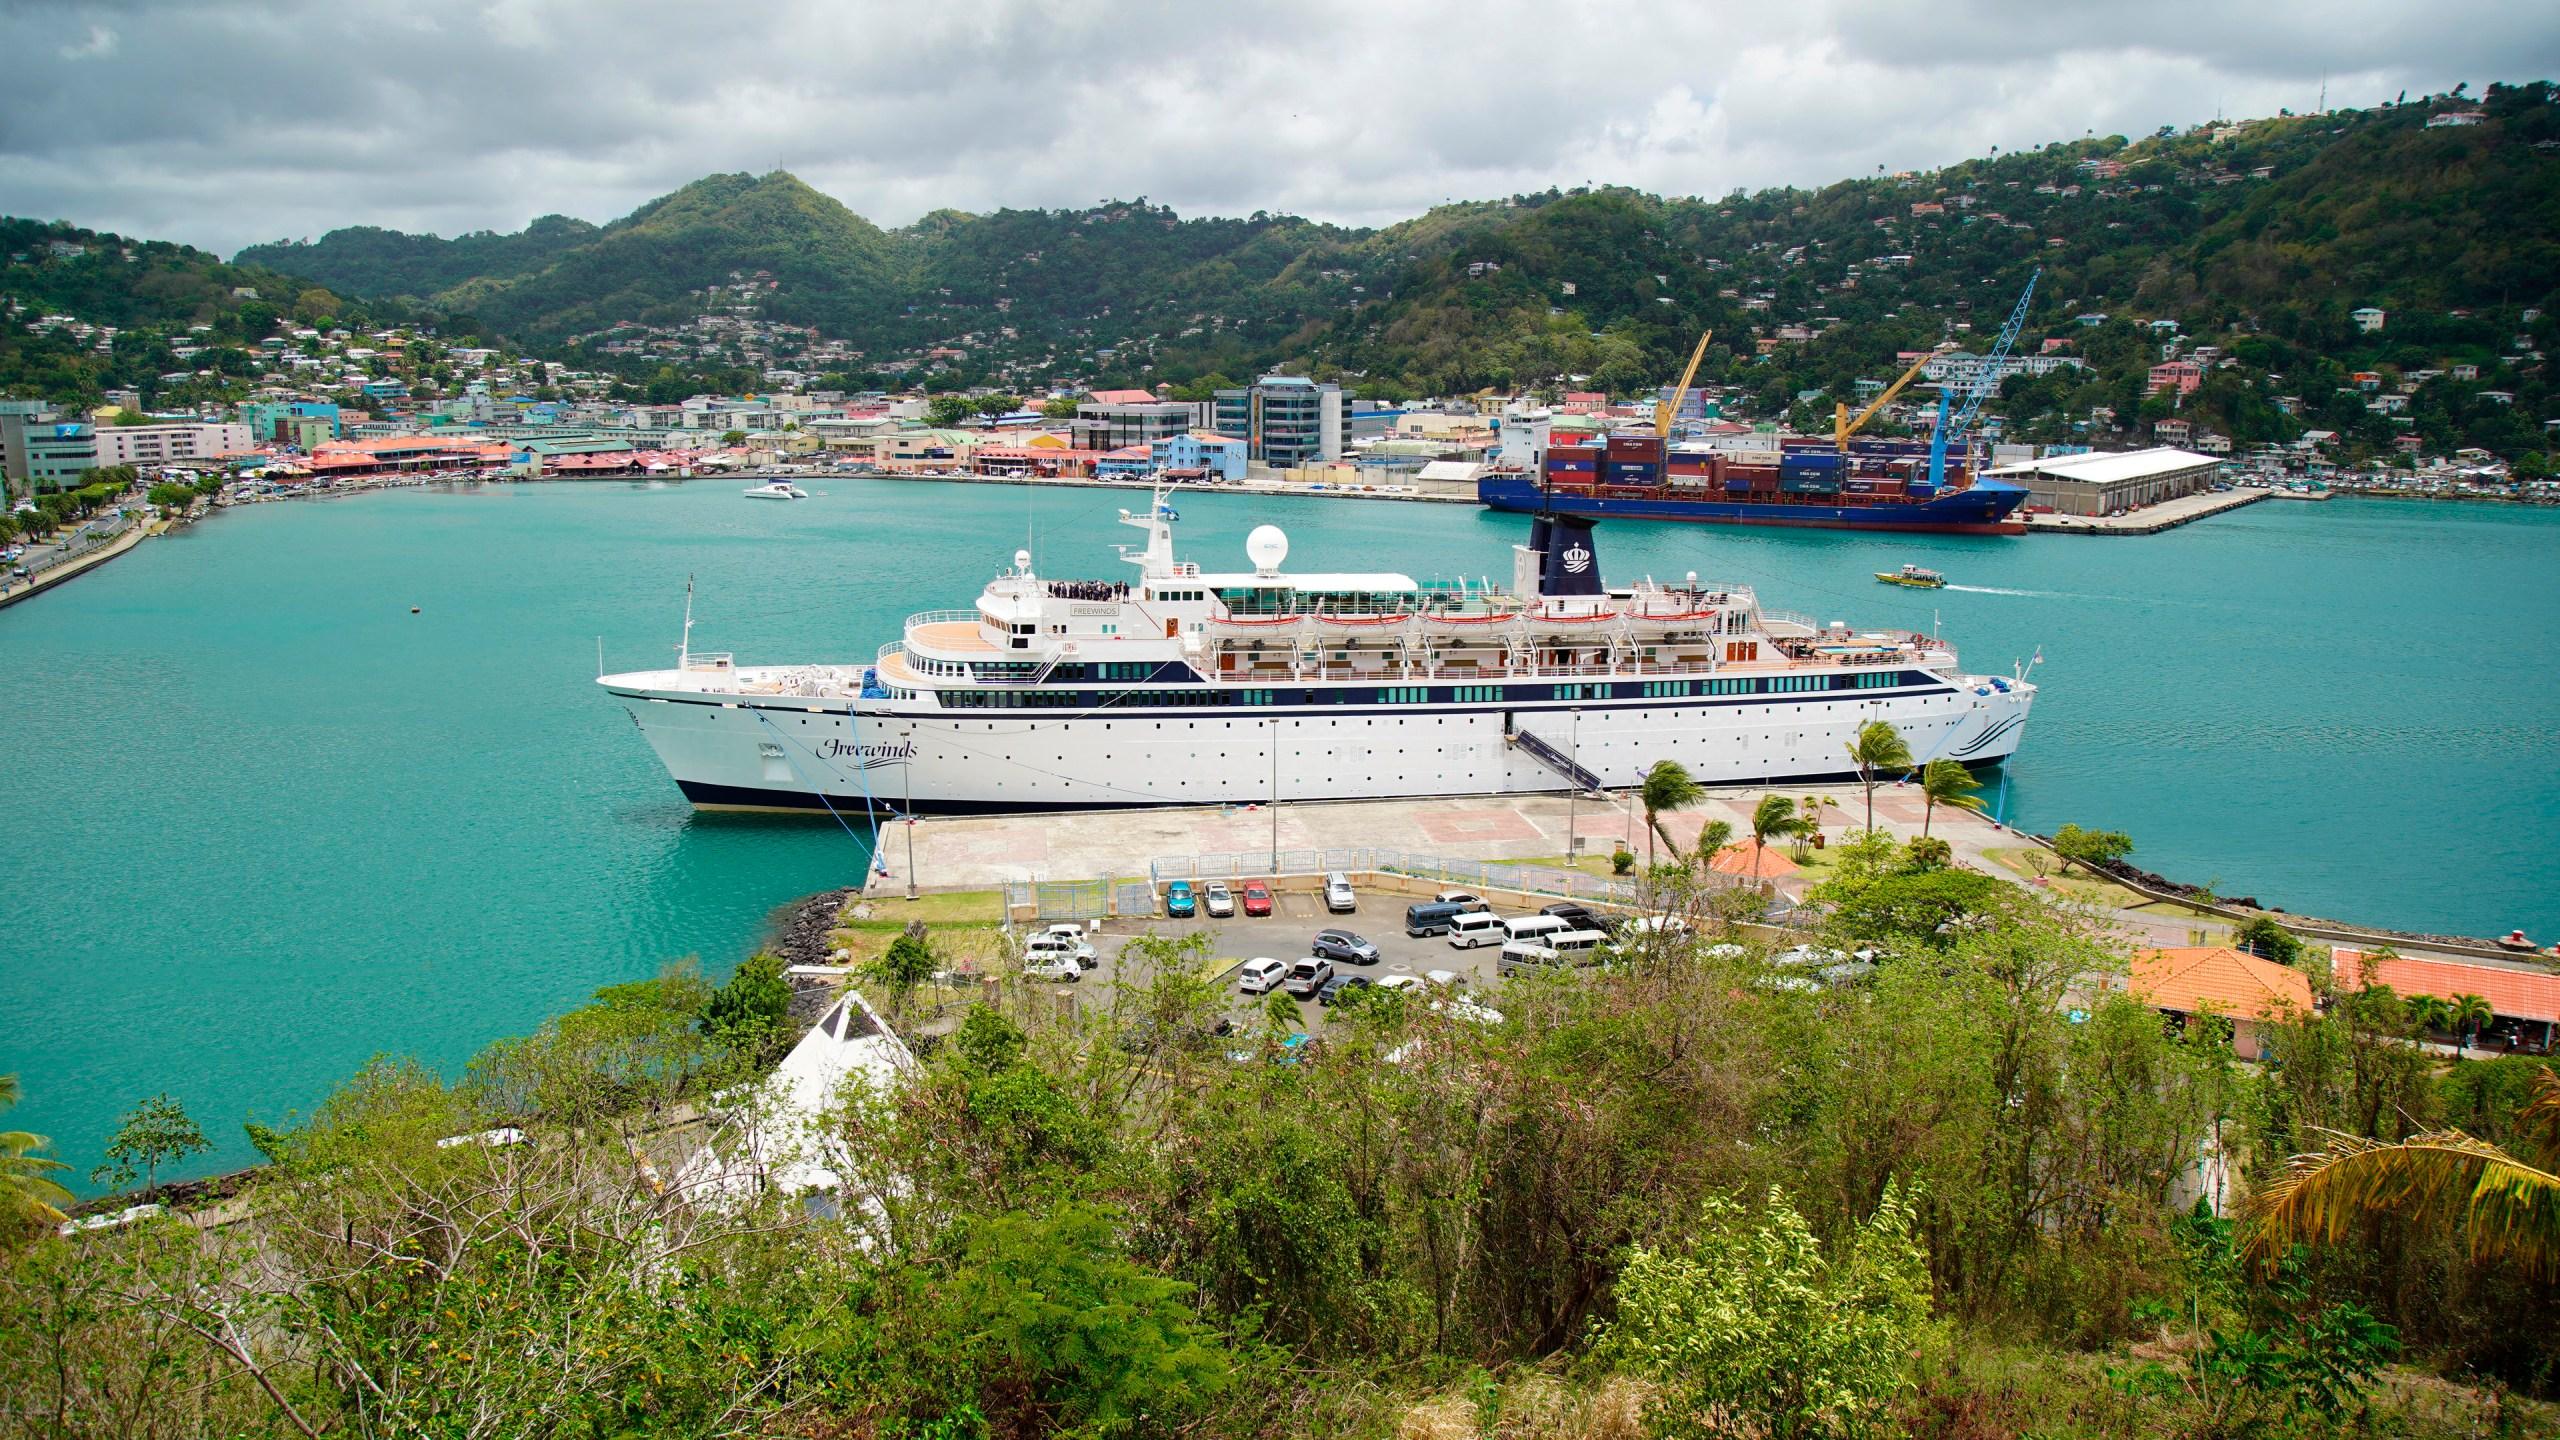 St_Lucia_US_Quarantined_Ship_34121-159532.jpg91531391